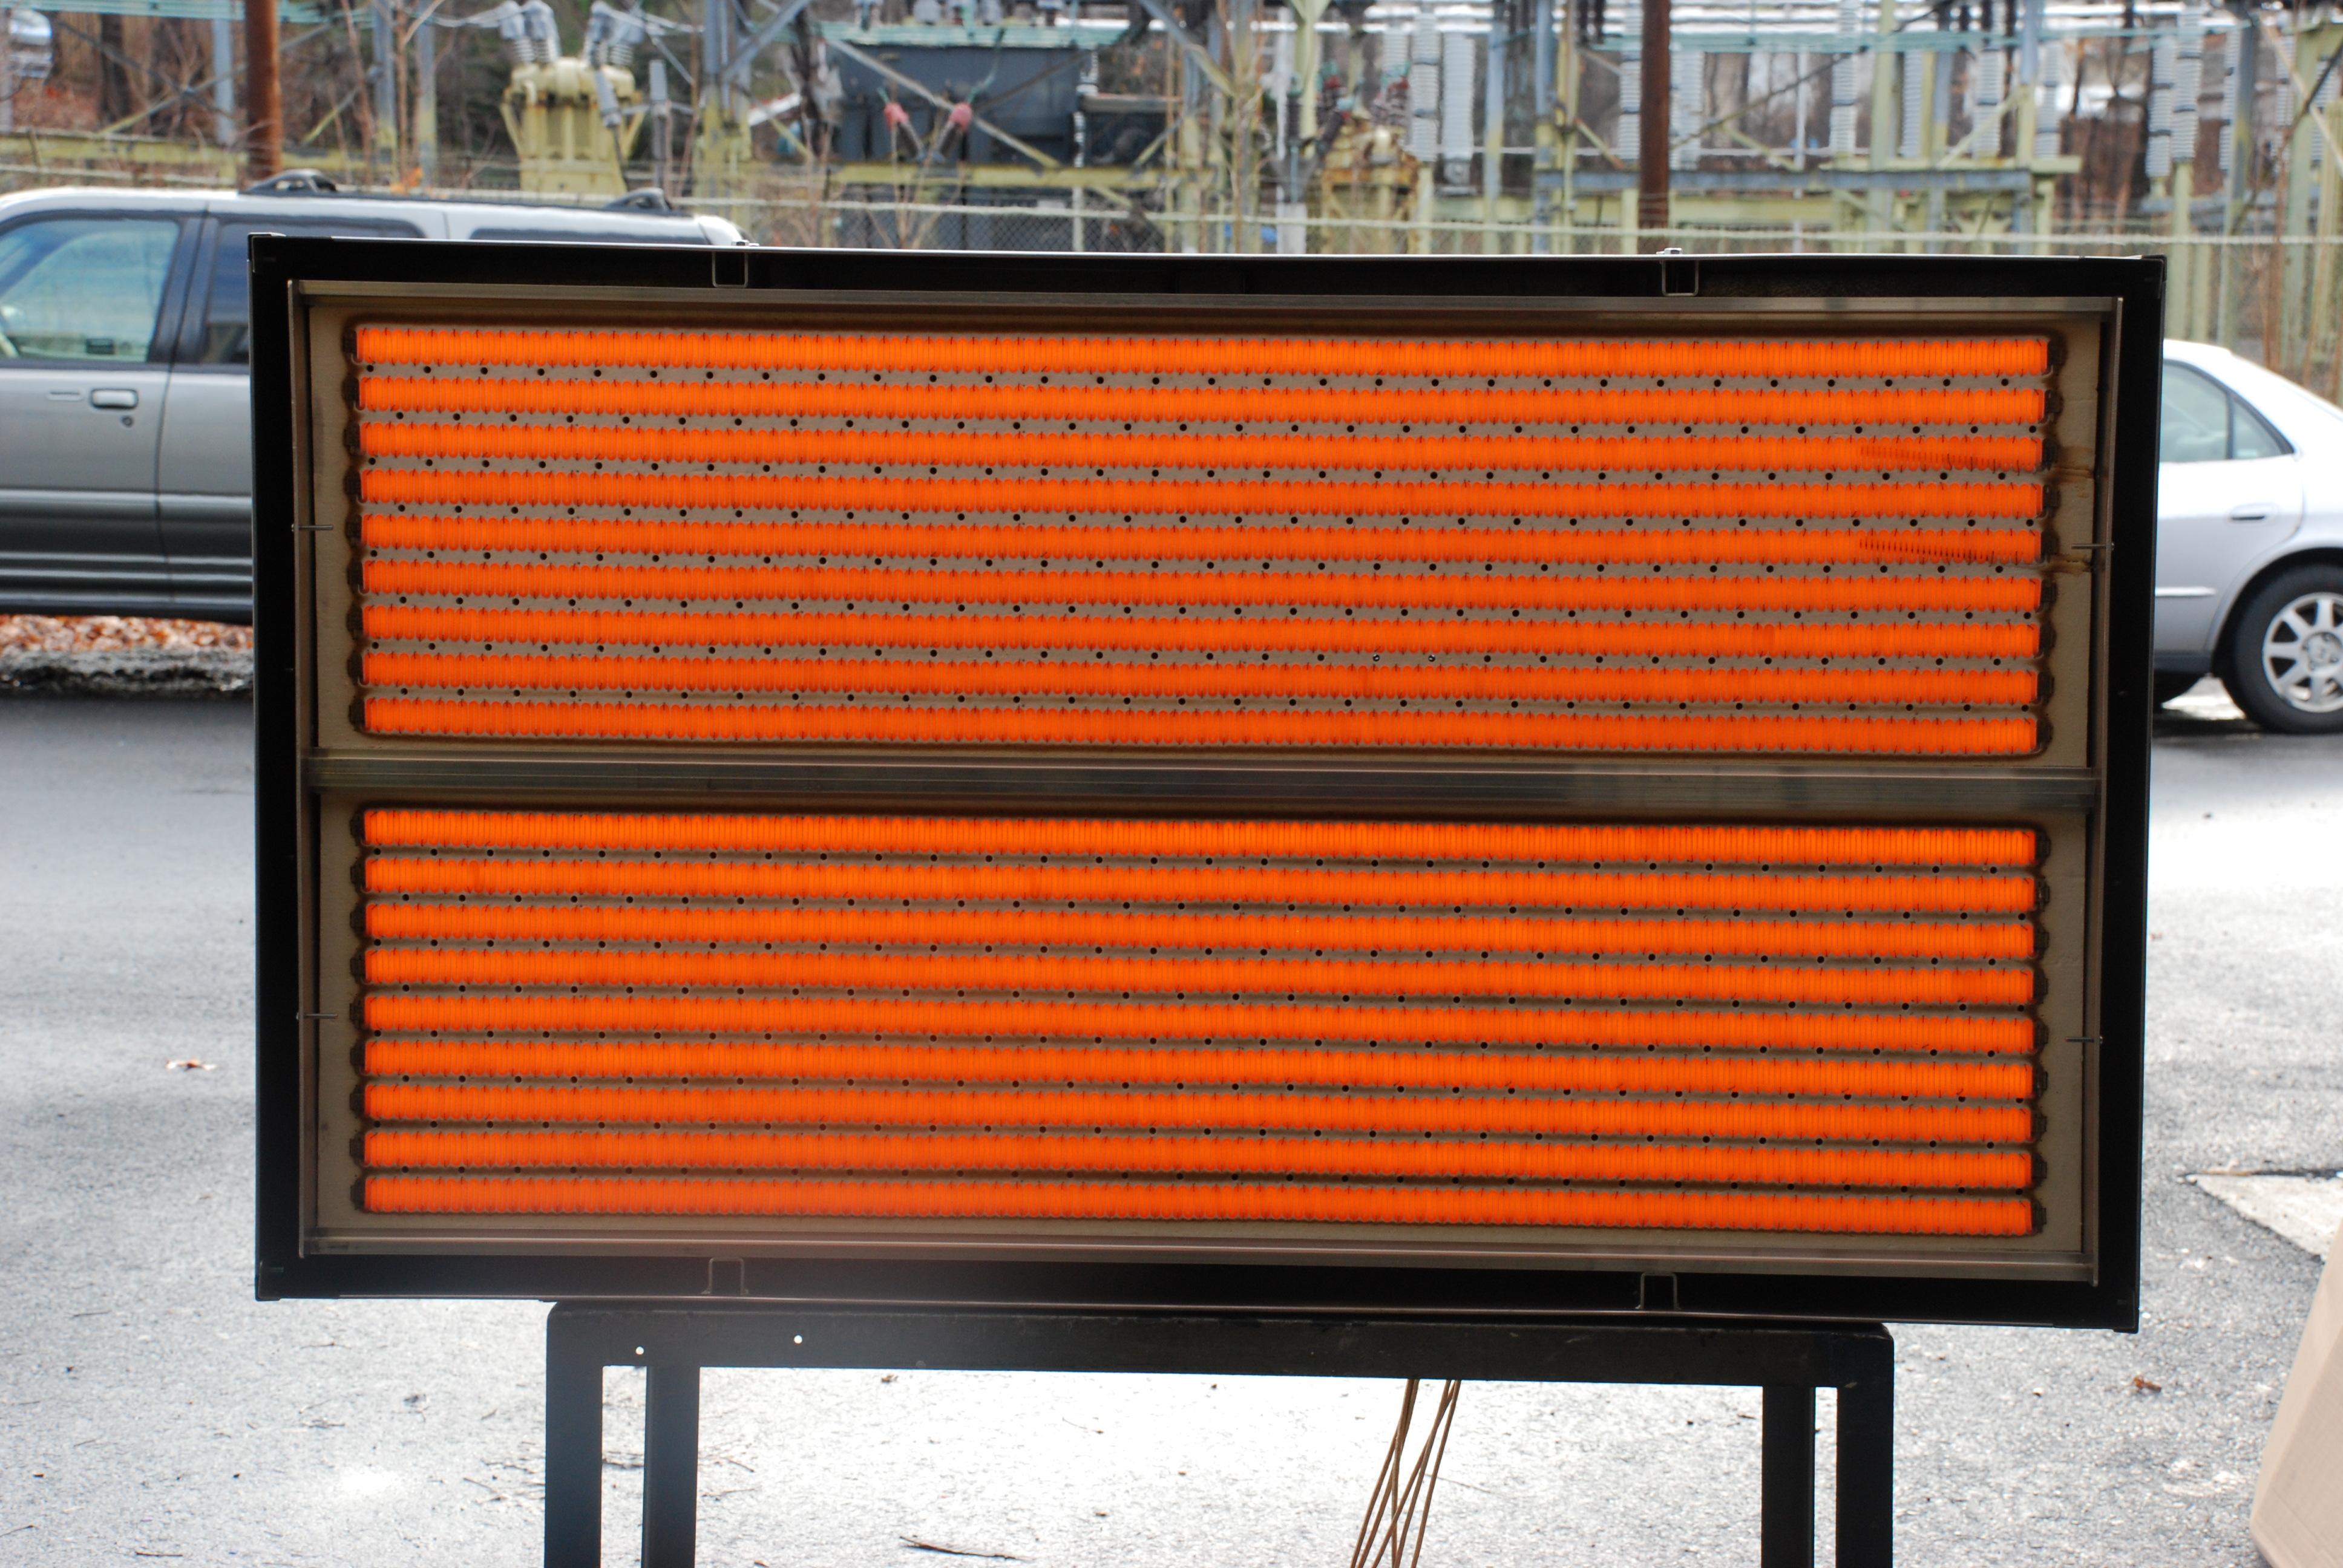 Lit SFA Industrial IR Panel Heaters